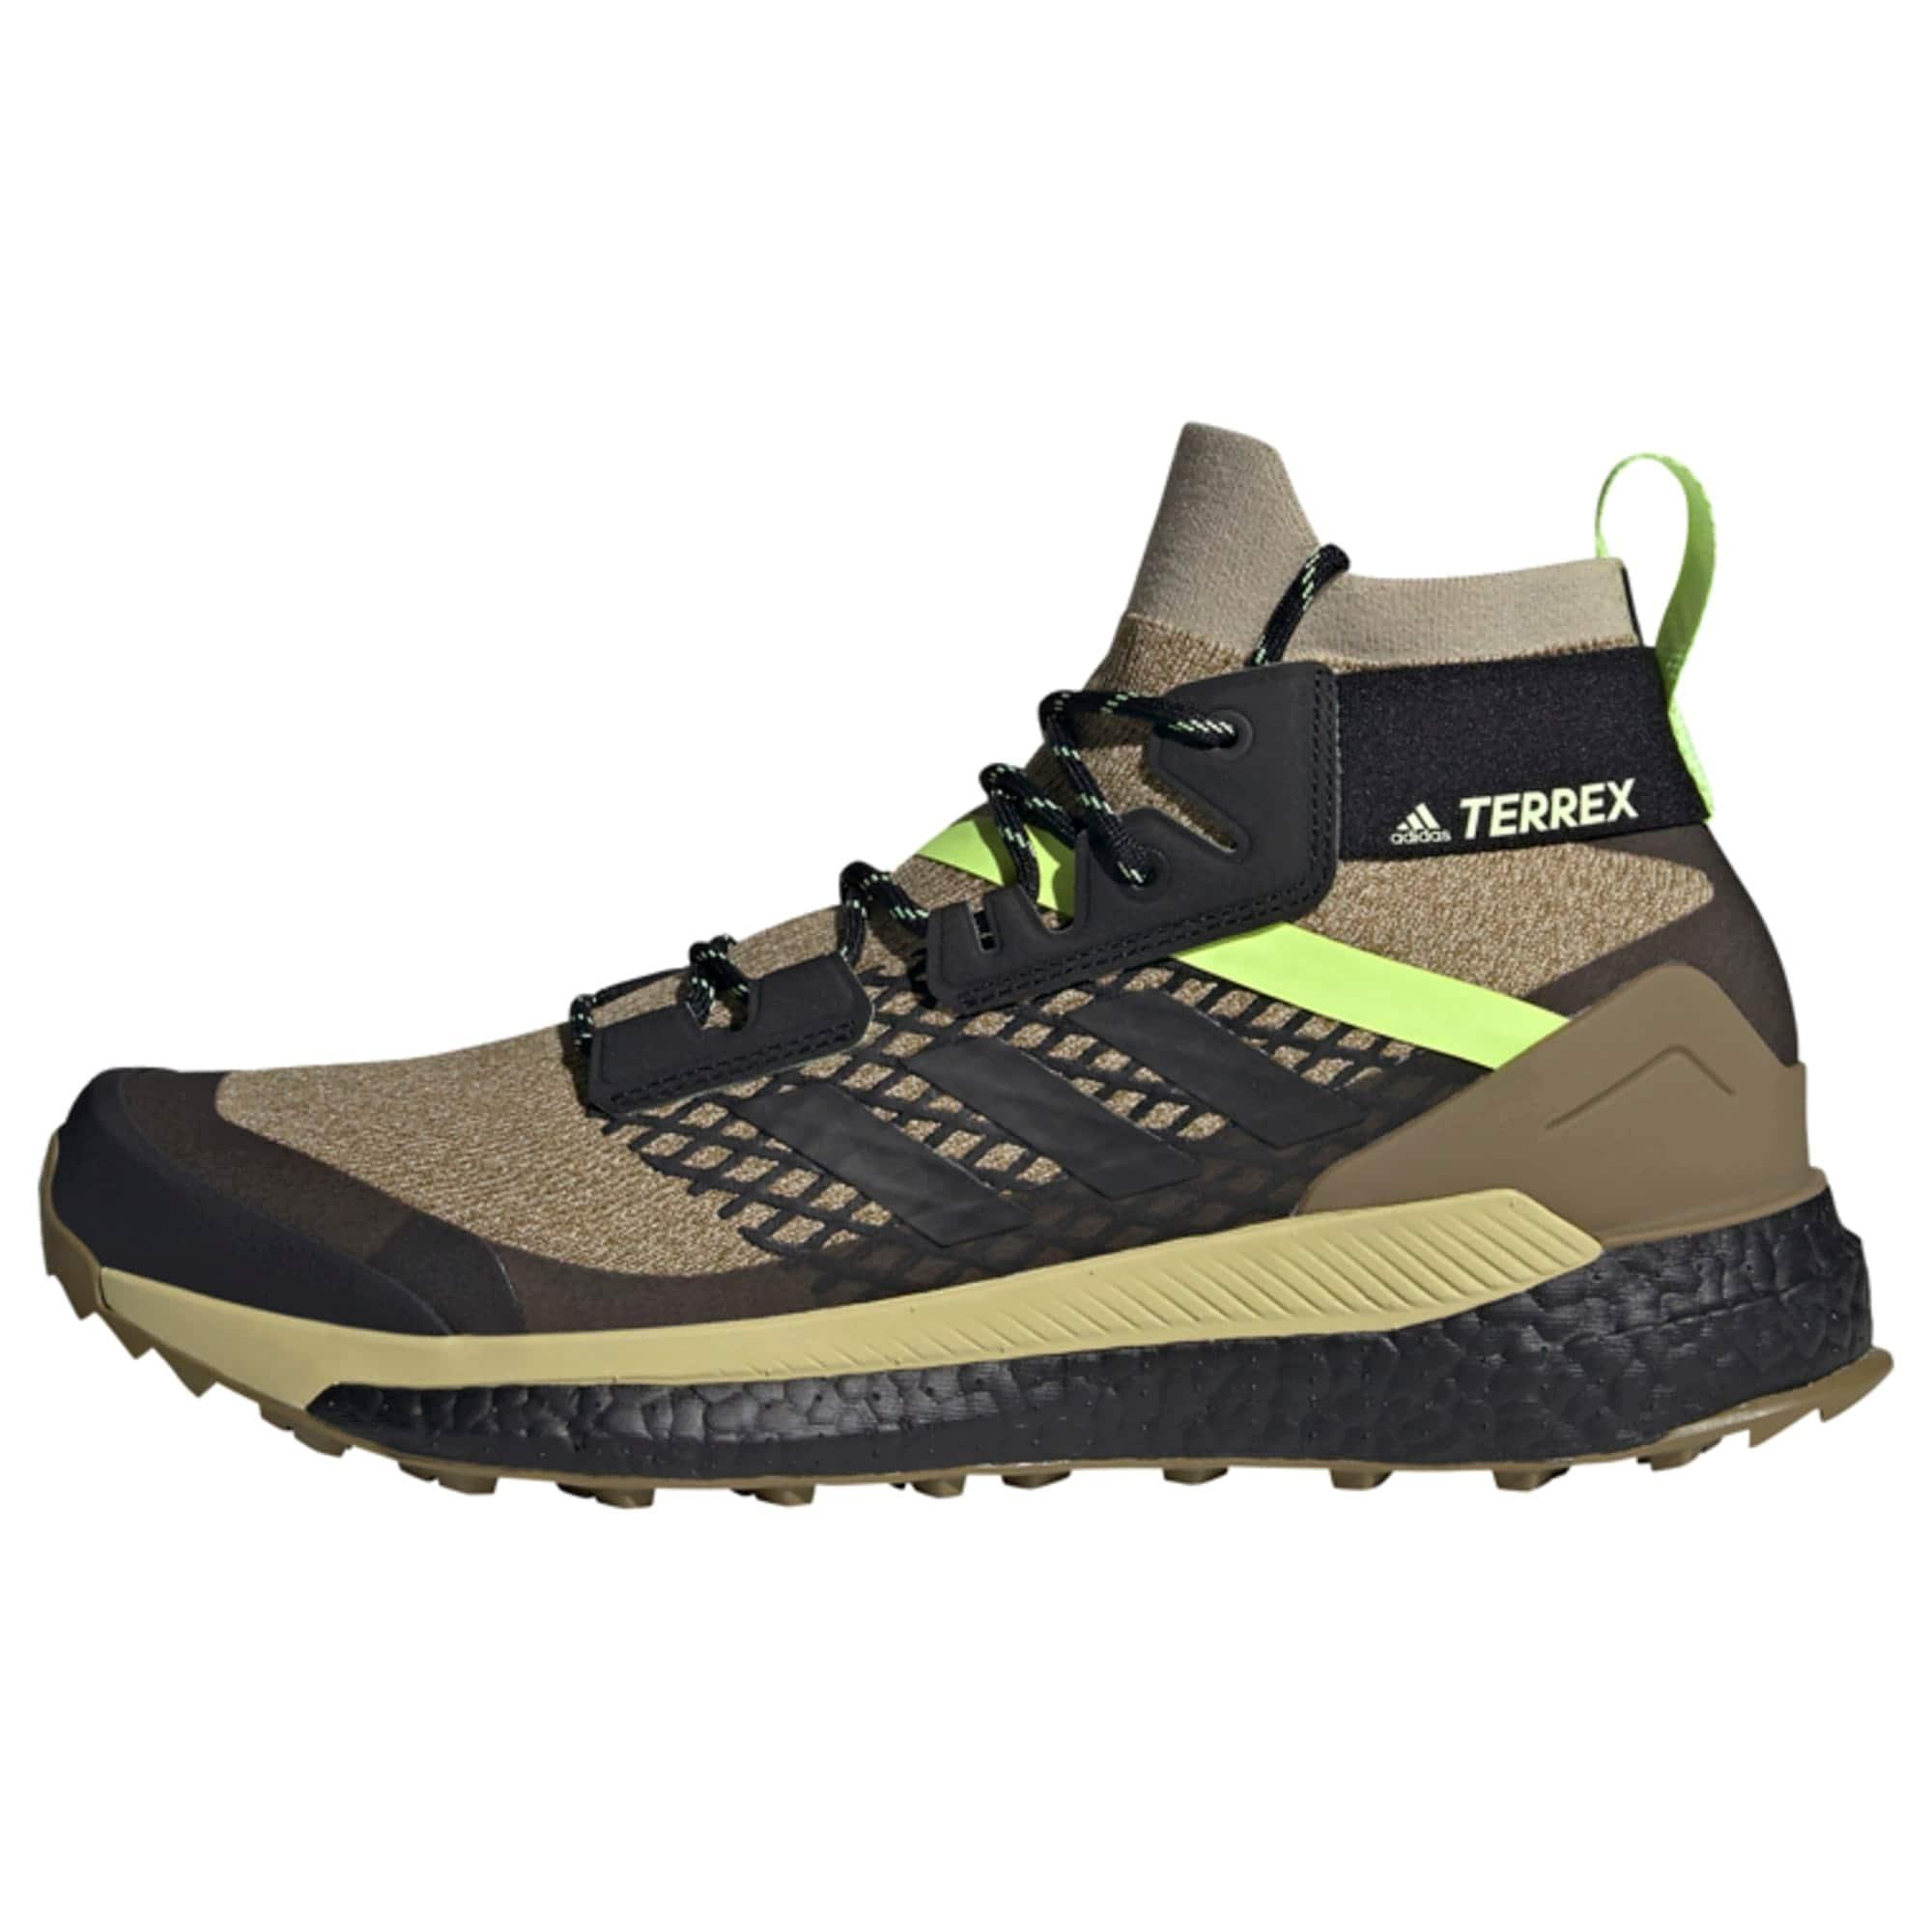 adidas Terrex Wanderschuh grün